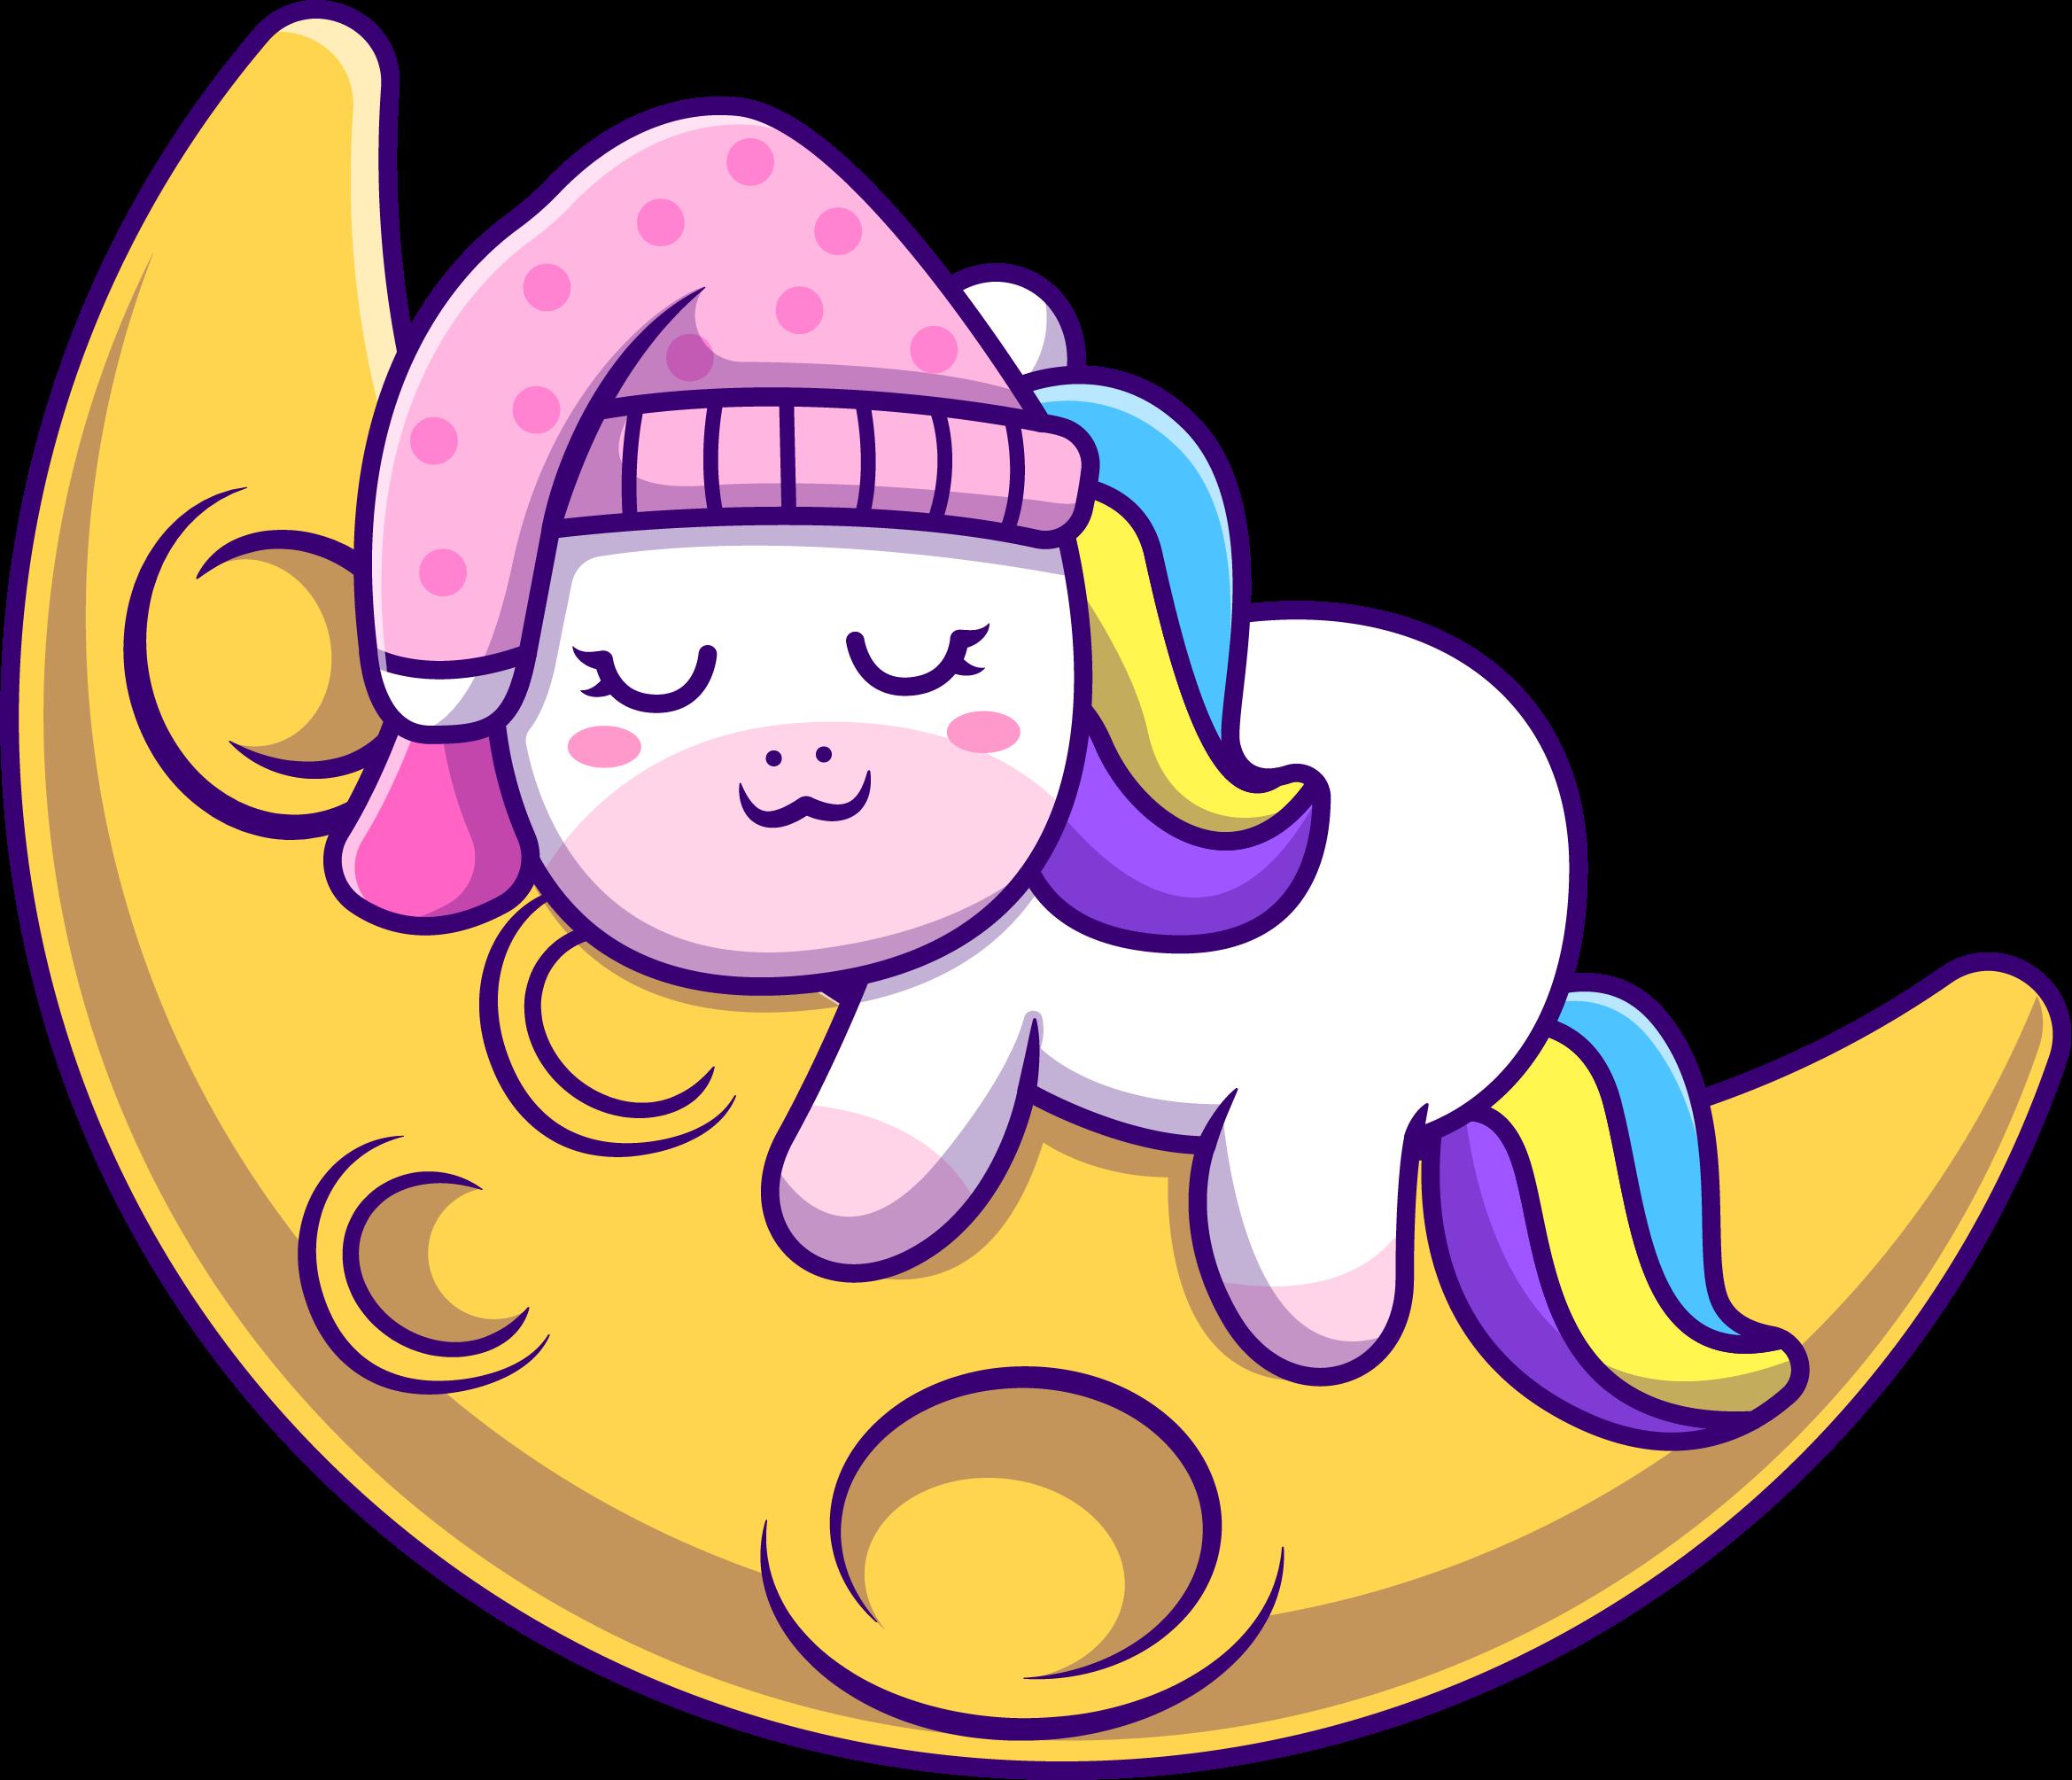 moonicorn_transparent